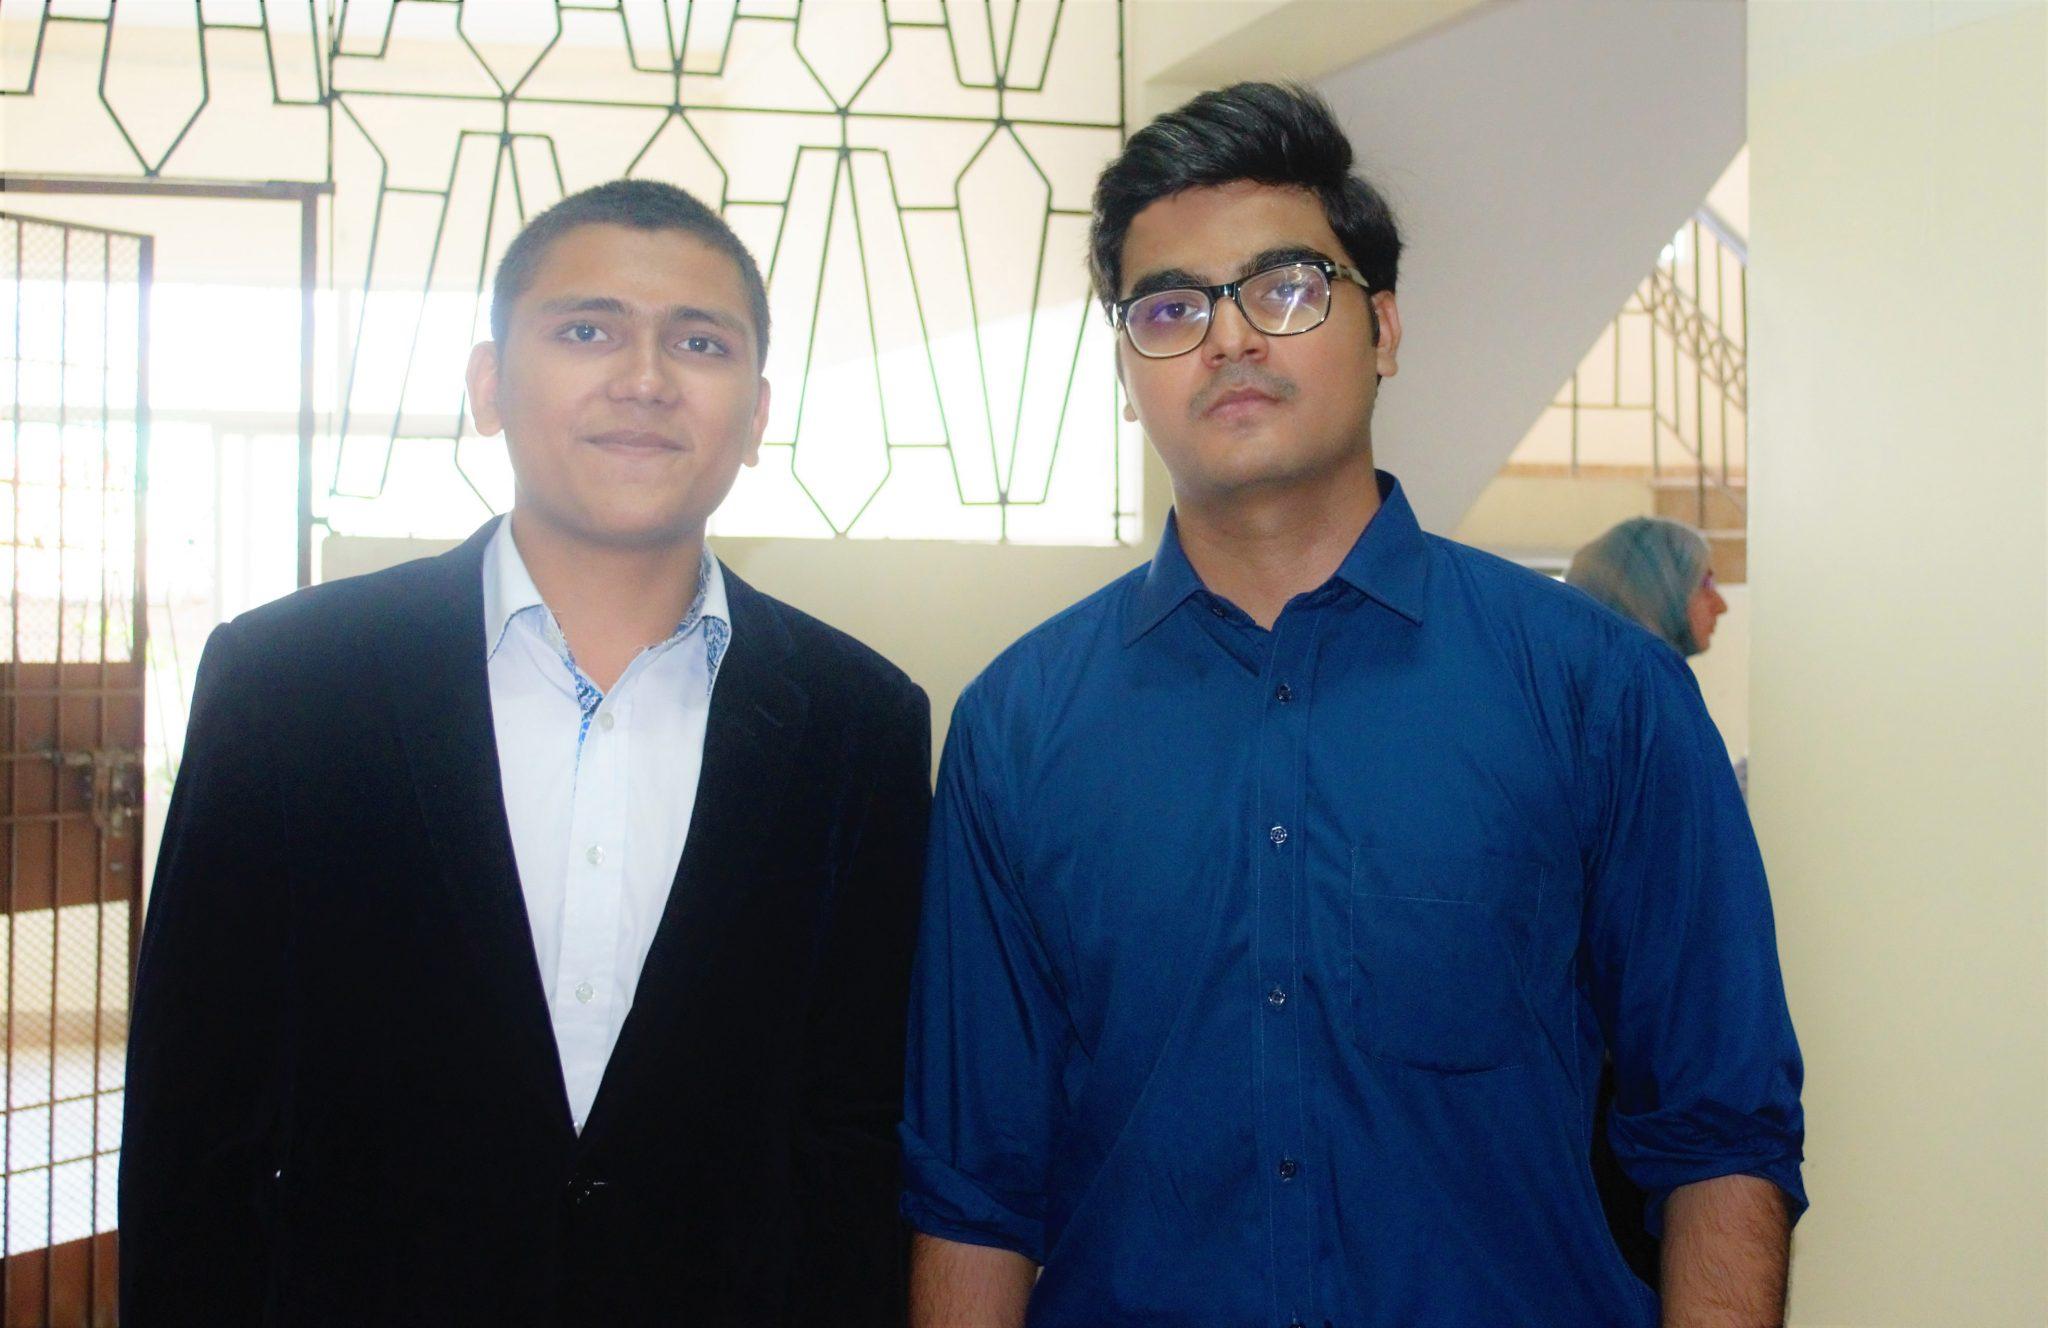 Abdul Samad Essani With Syed Faizan Ali At Workshop